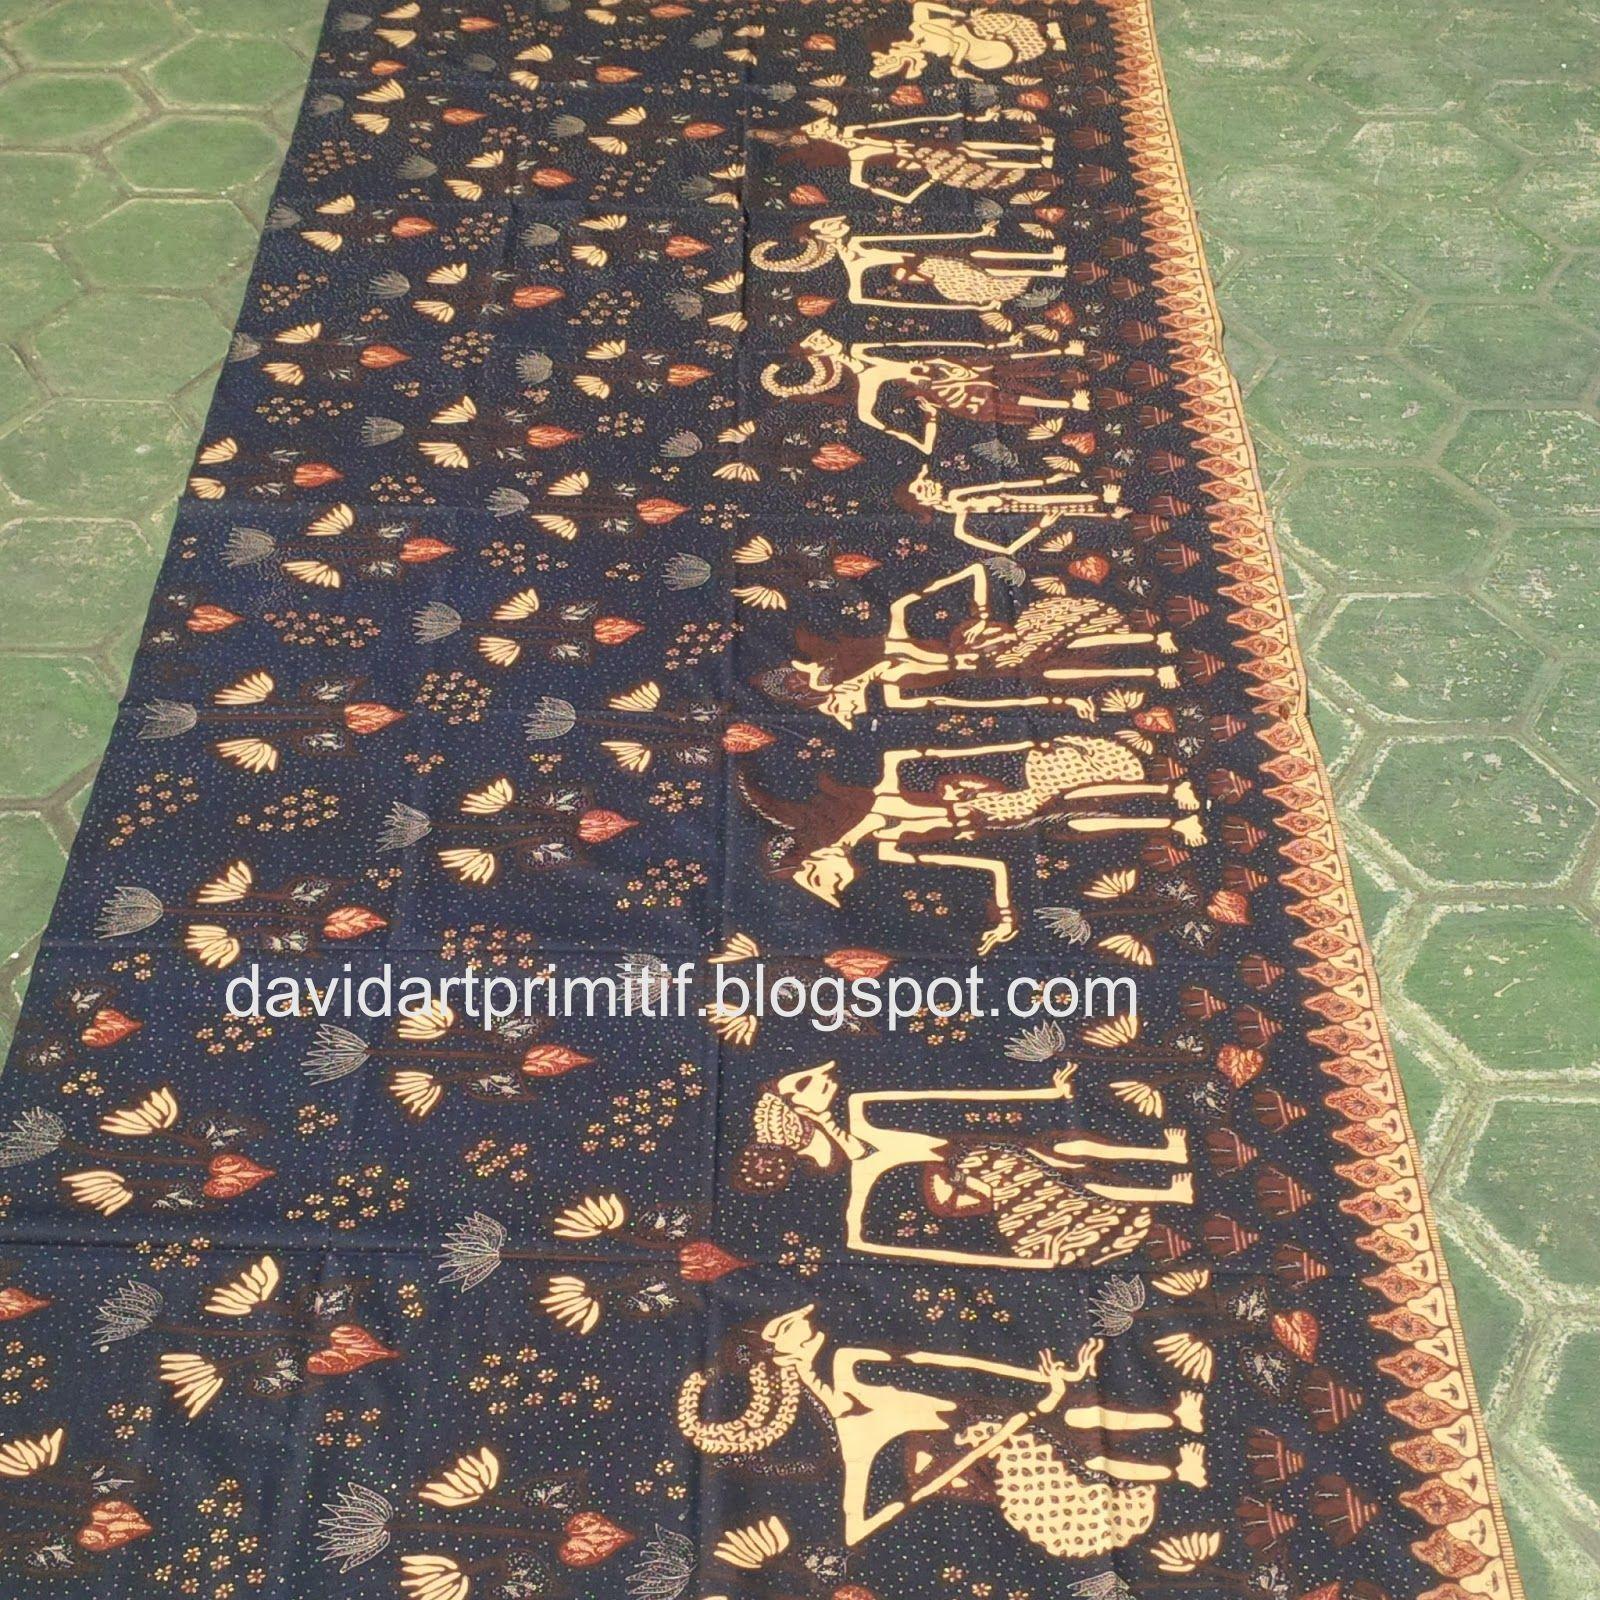 4 Penemu Batik Tulis: Art & Primitif: Batik Tulis Cirebon Motif Wayang